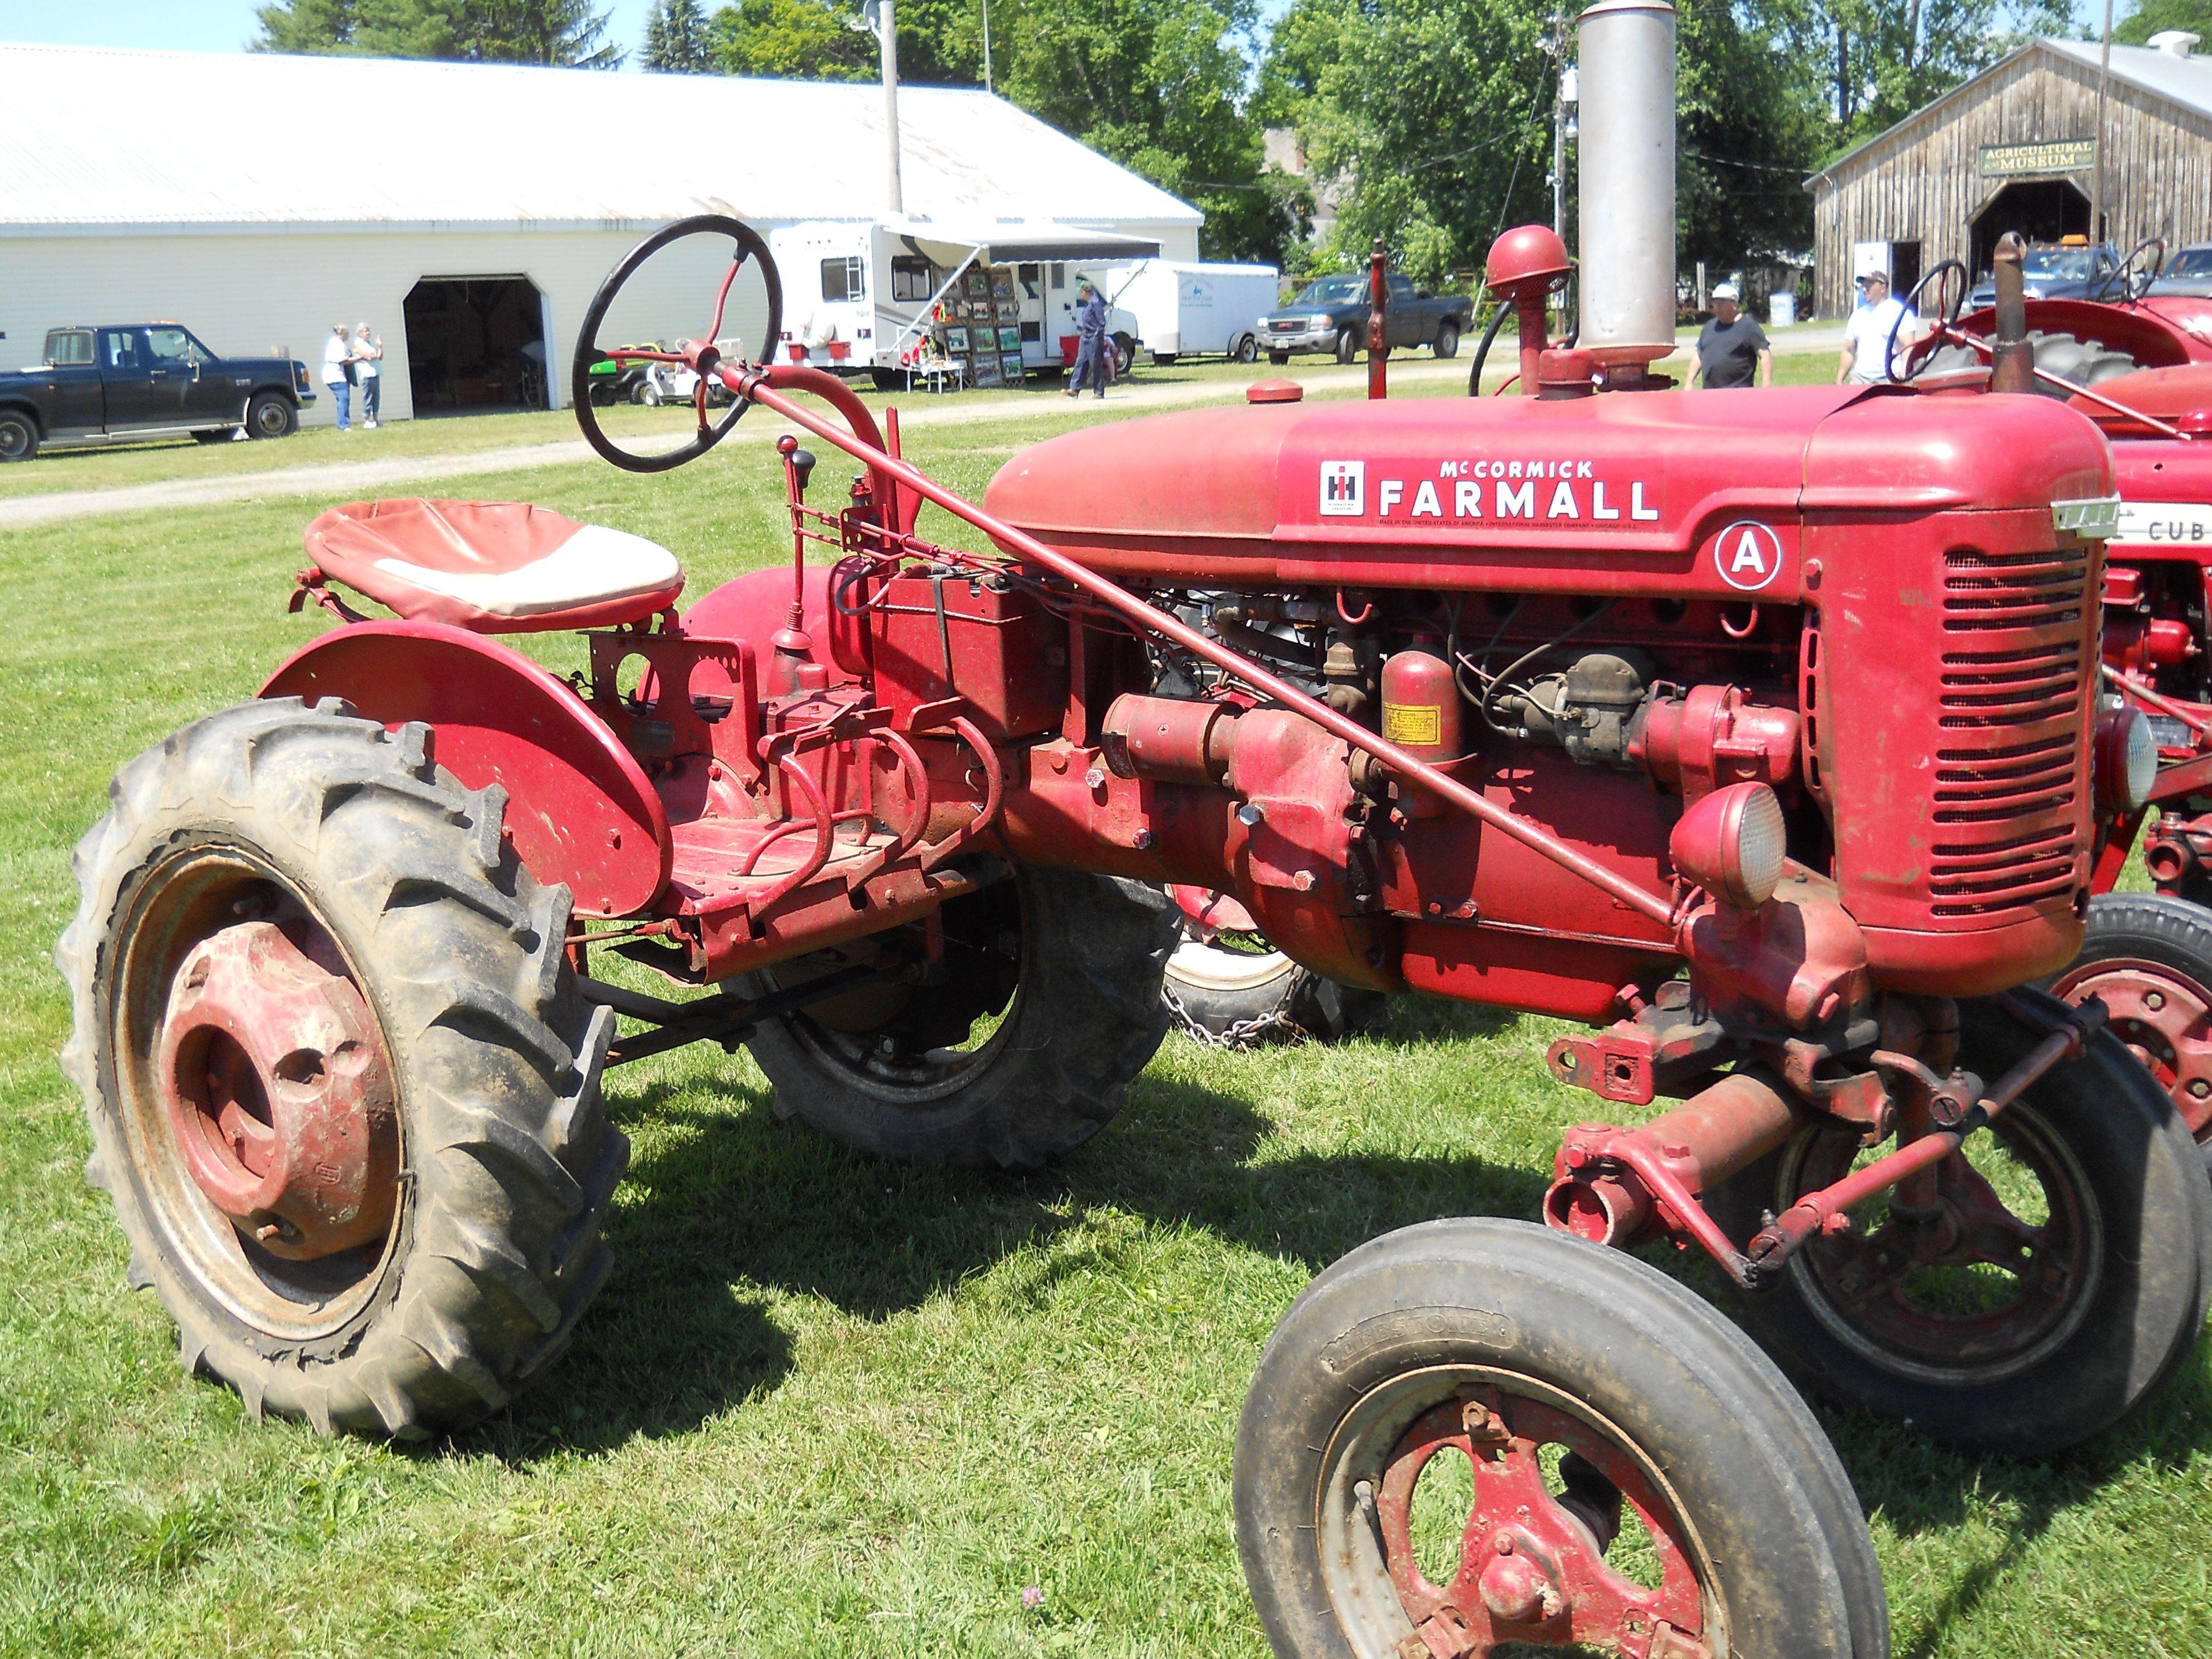 Farmall A Tractor Tractors Farmall Tractors Farmall